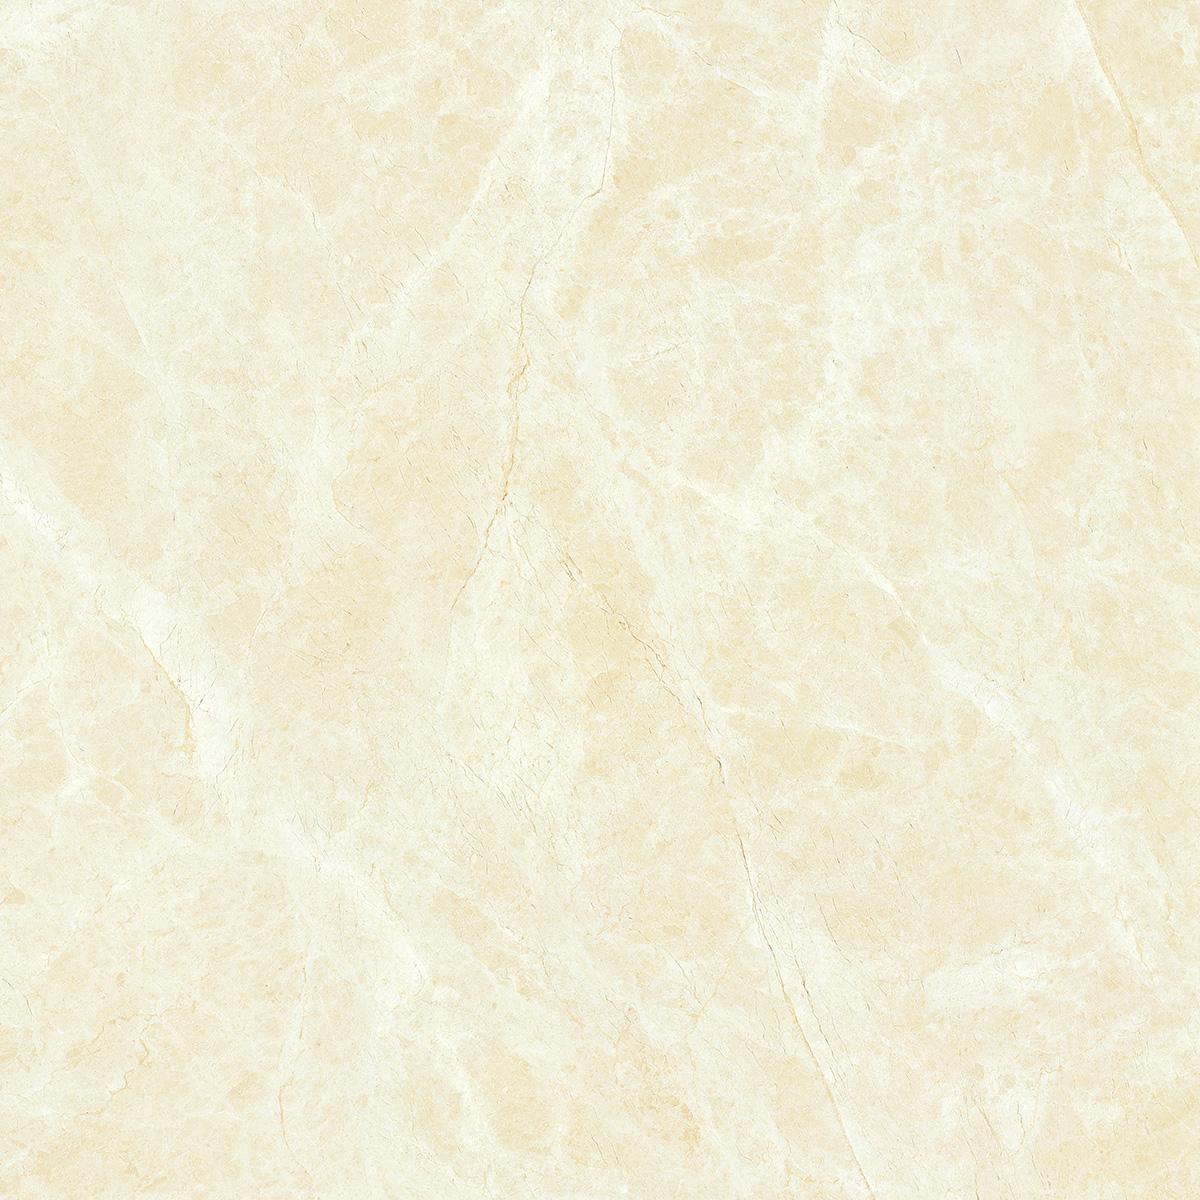 索菲亚米黄  HG80101,800×800